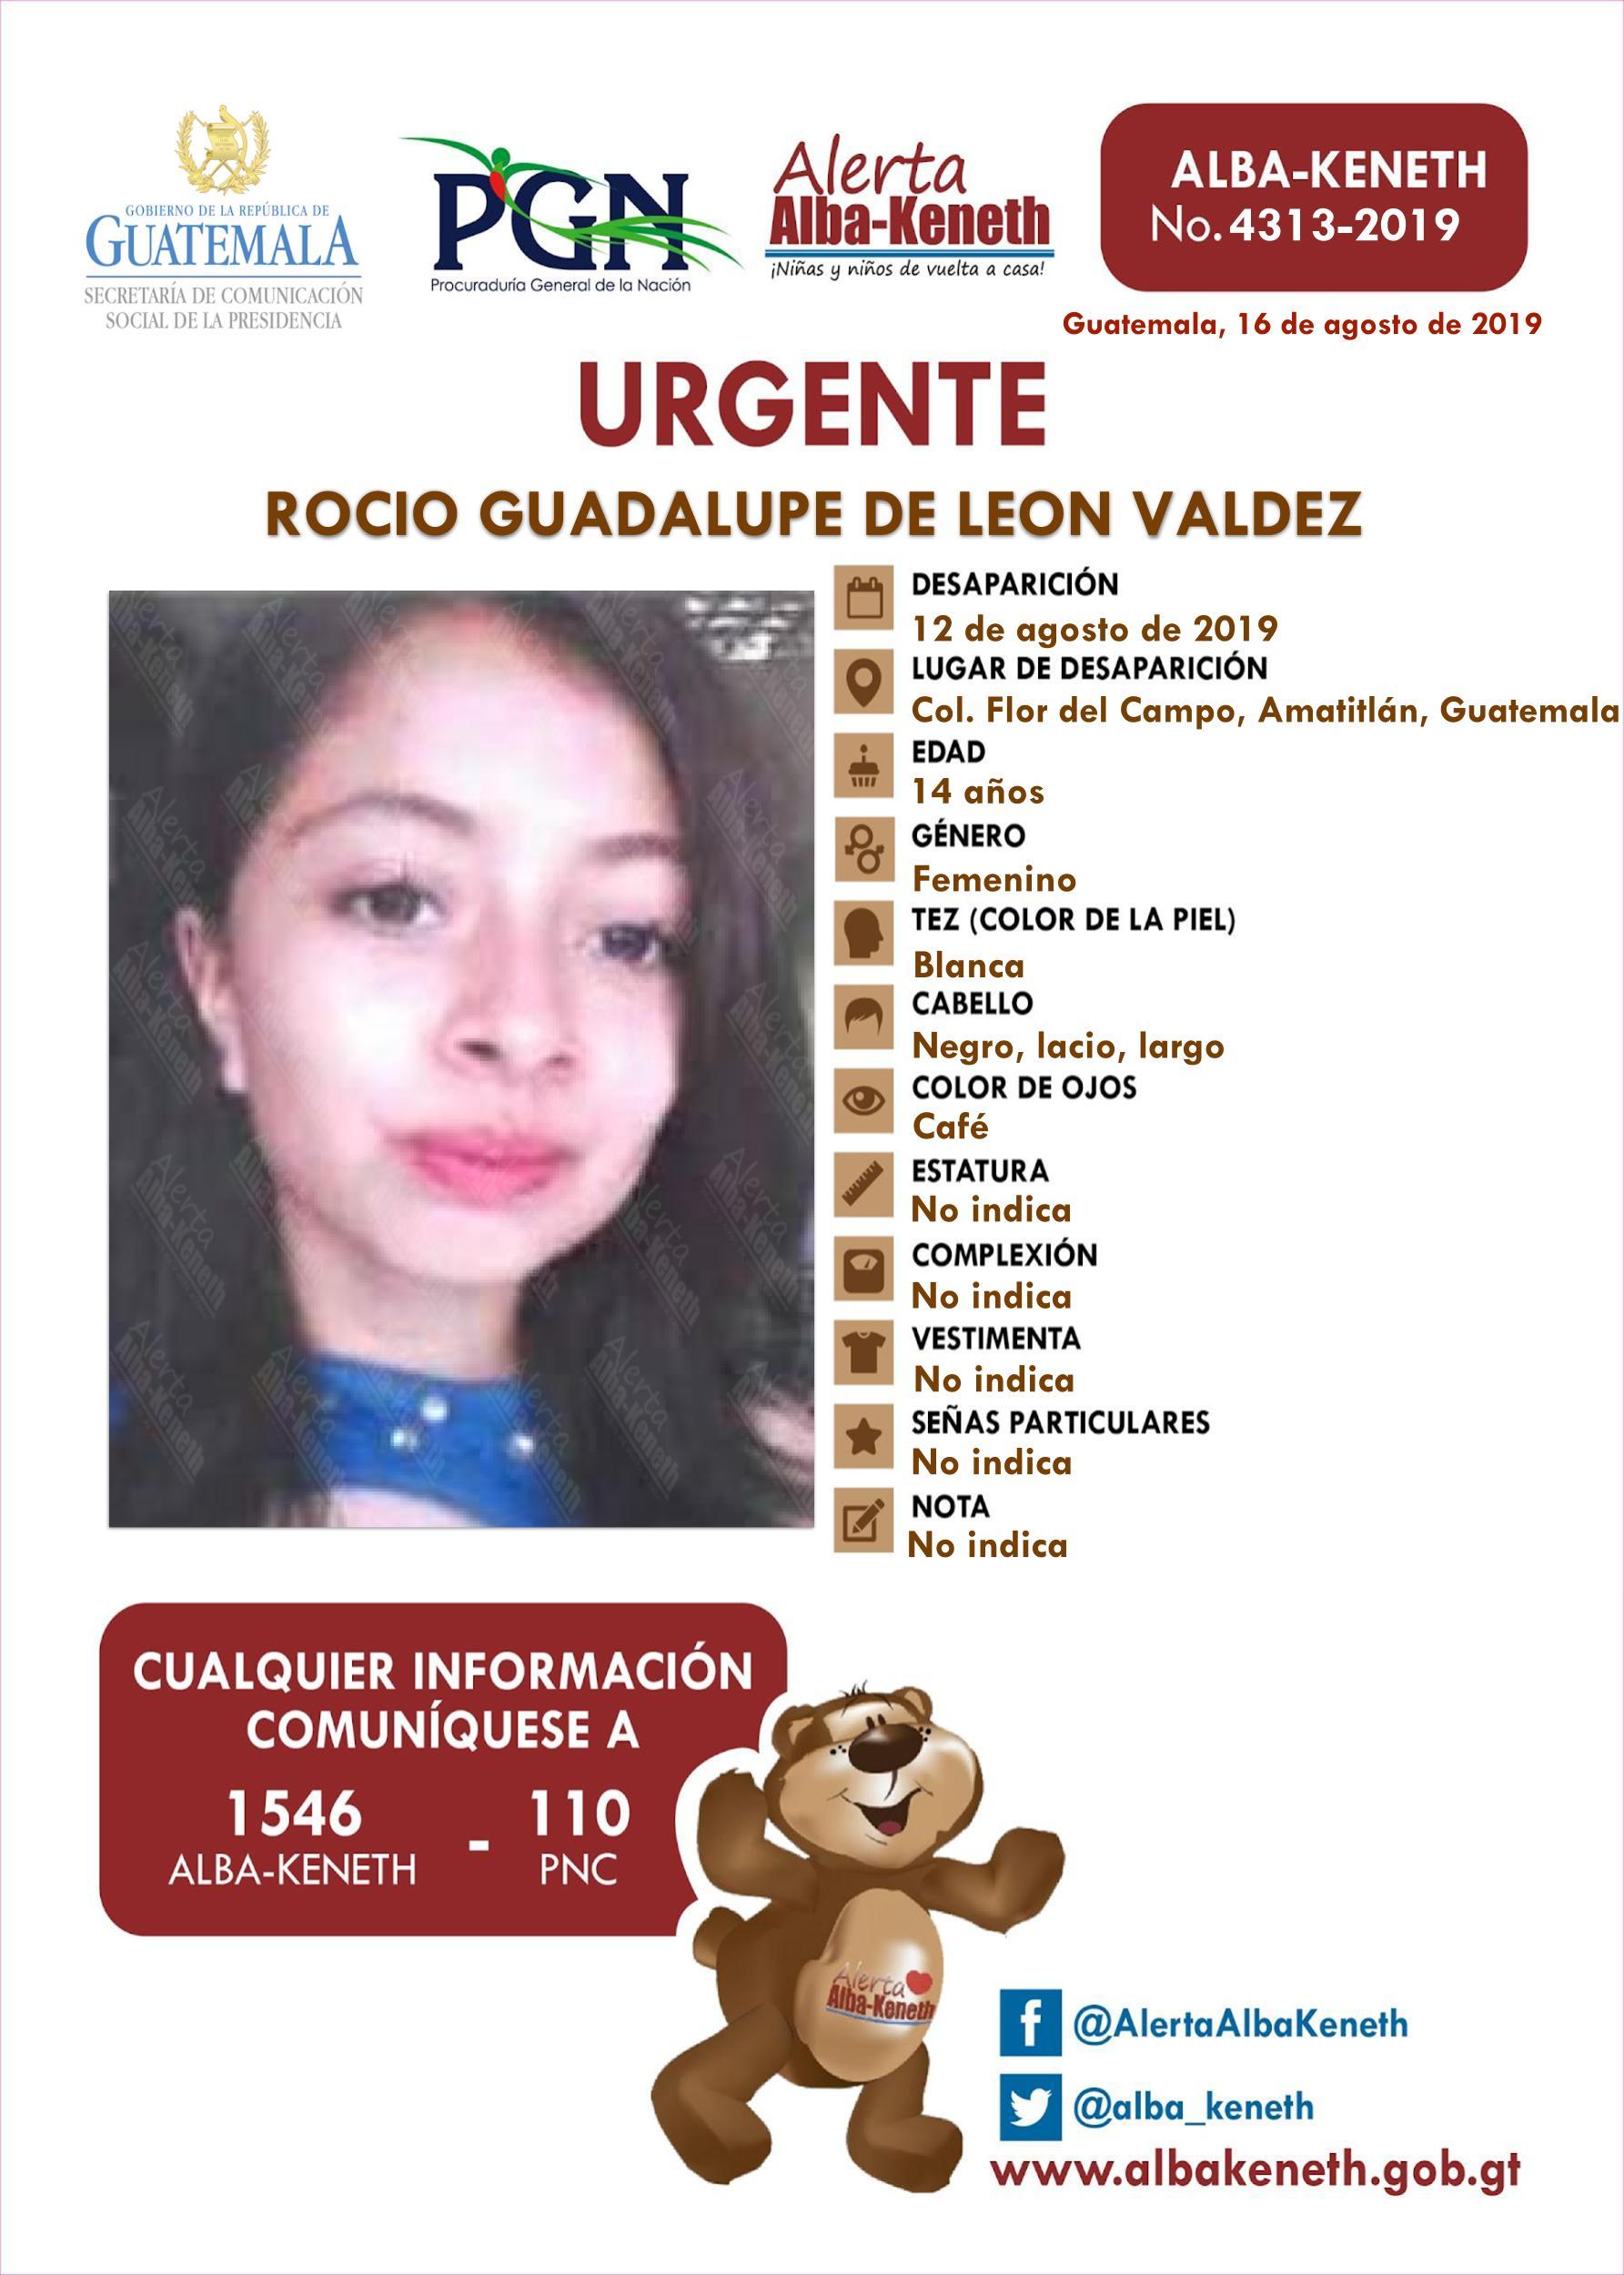 Rocio Guadalupe de Leon Valdez